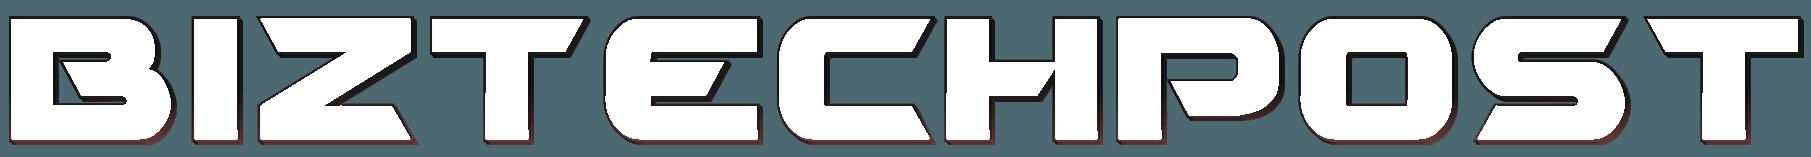 The BizTech Post